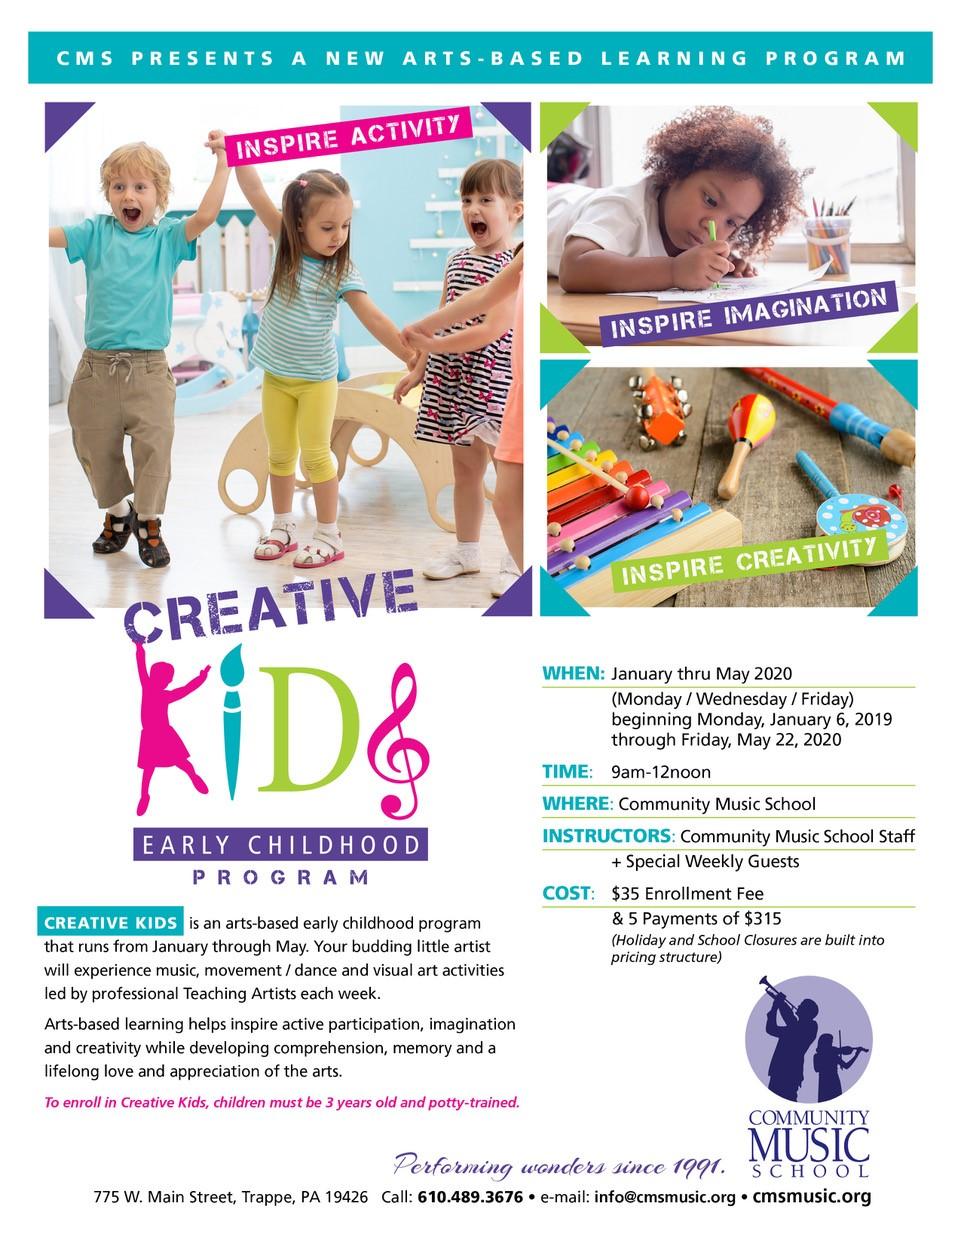 creative Kids Early Childhood program